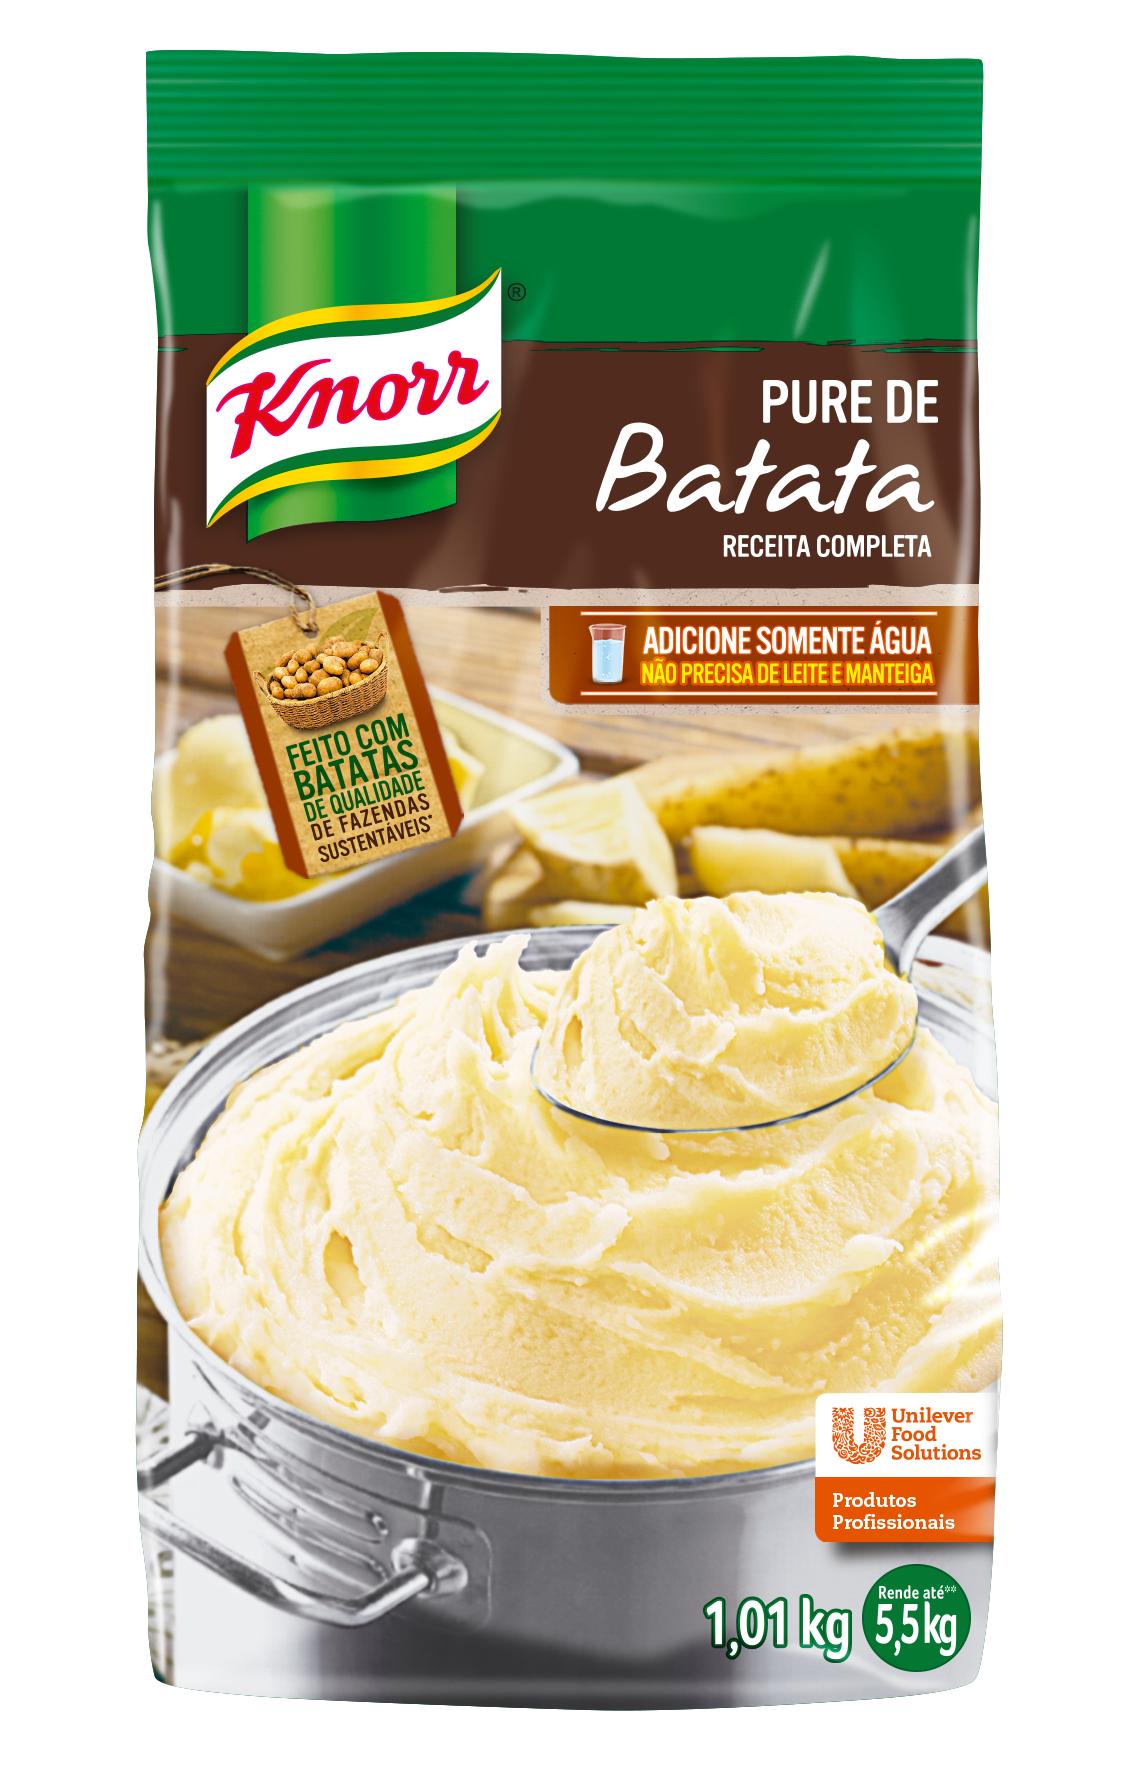 Purê de Batatas Knorr 1,01 kg